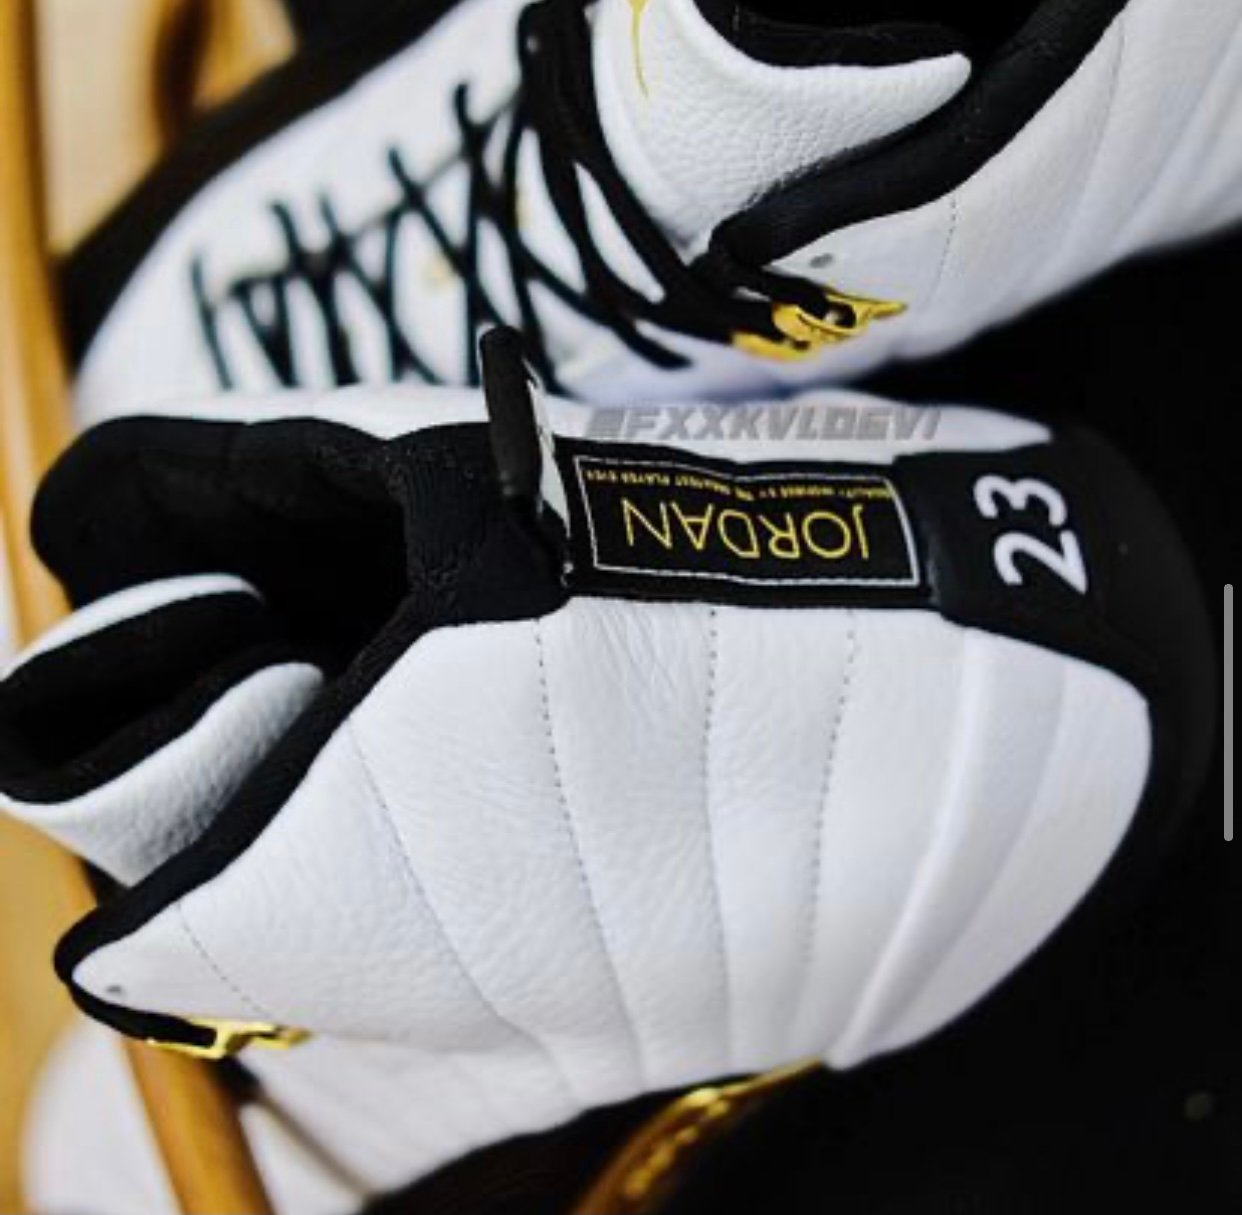 Air Jordan 12 Royalty White Black Gold CT8013-170 Release Info